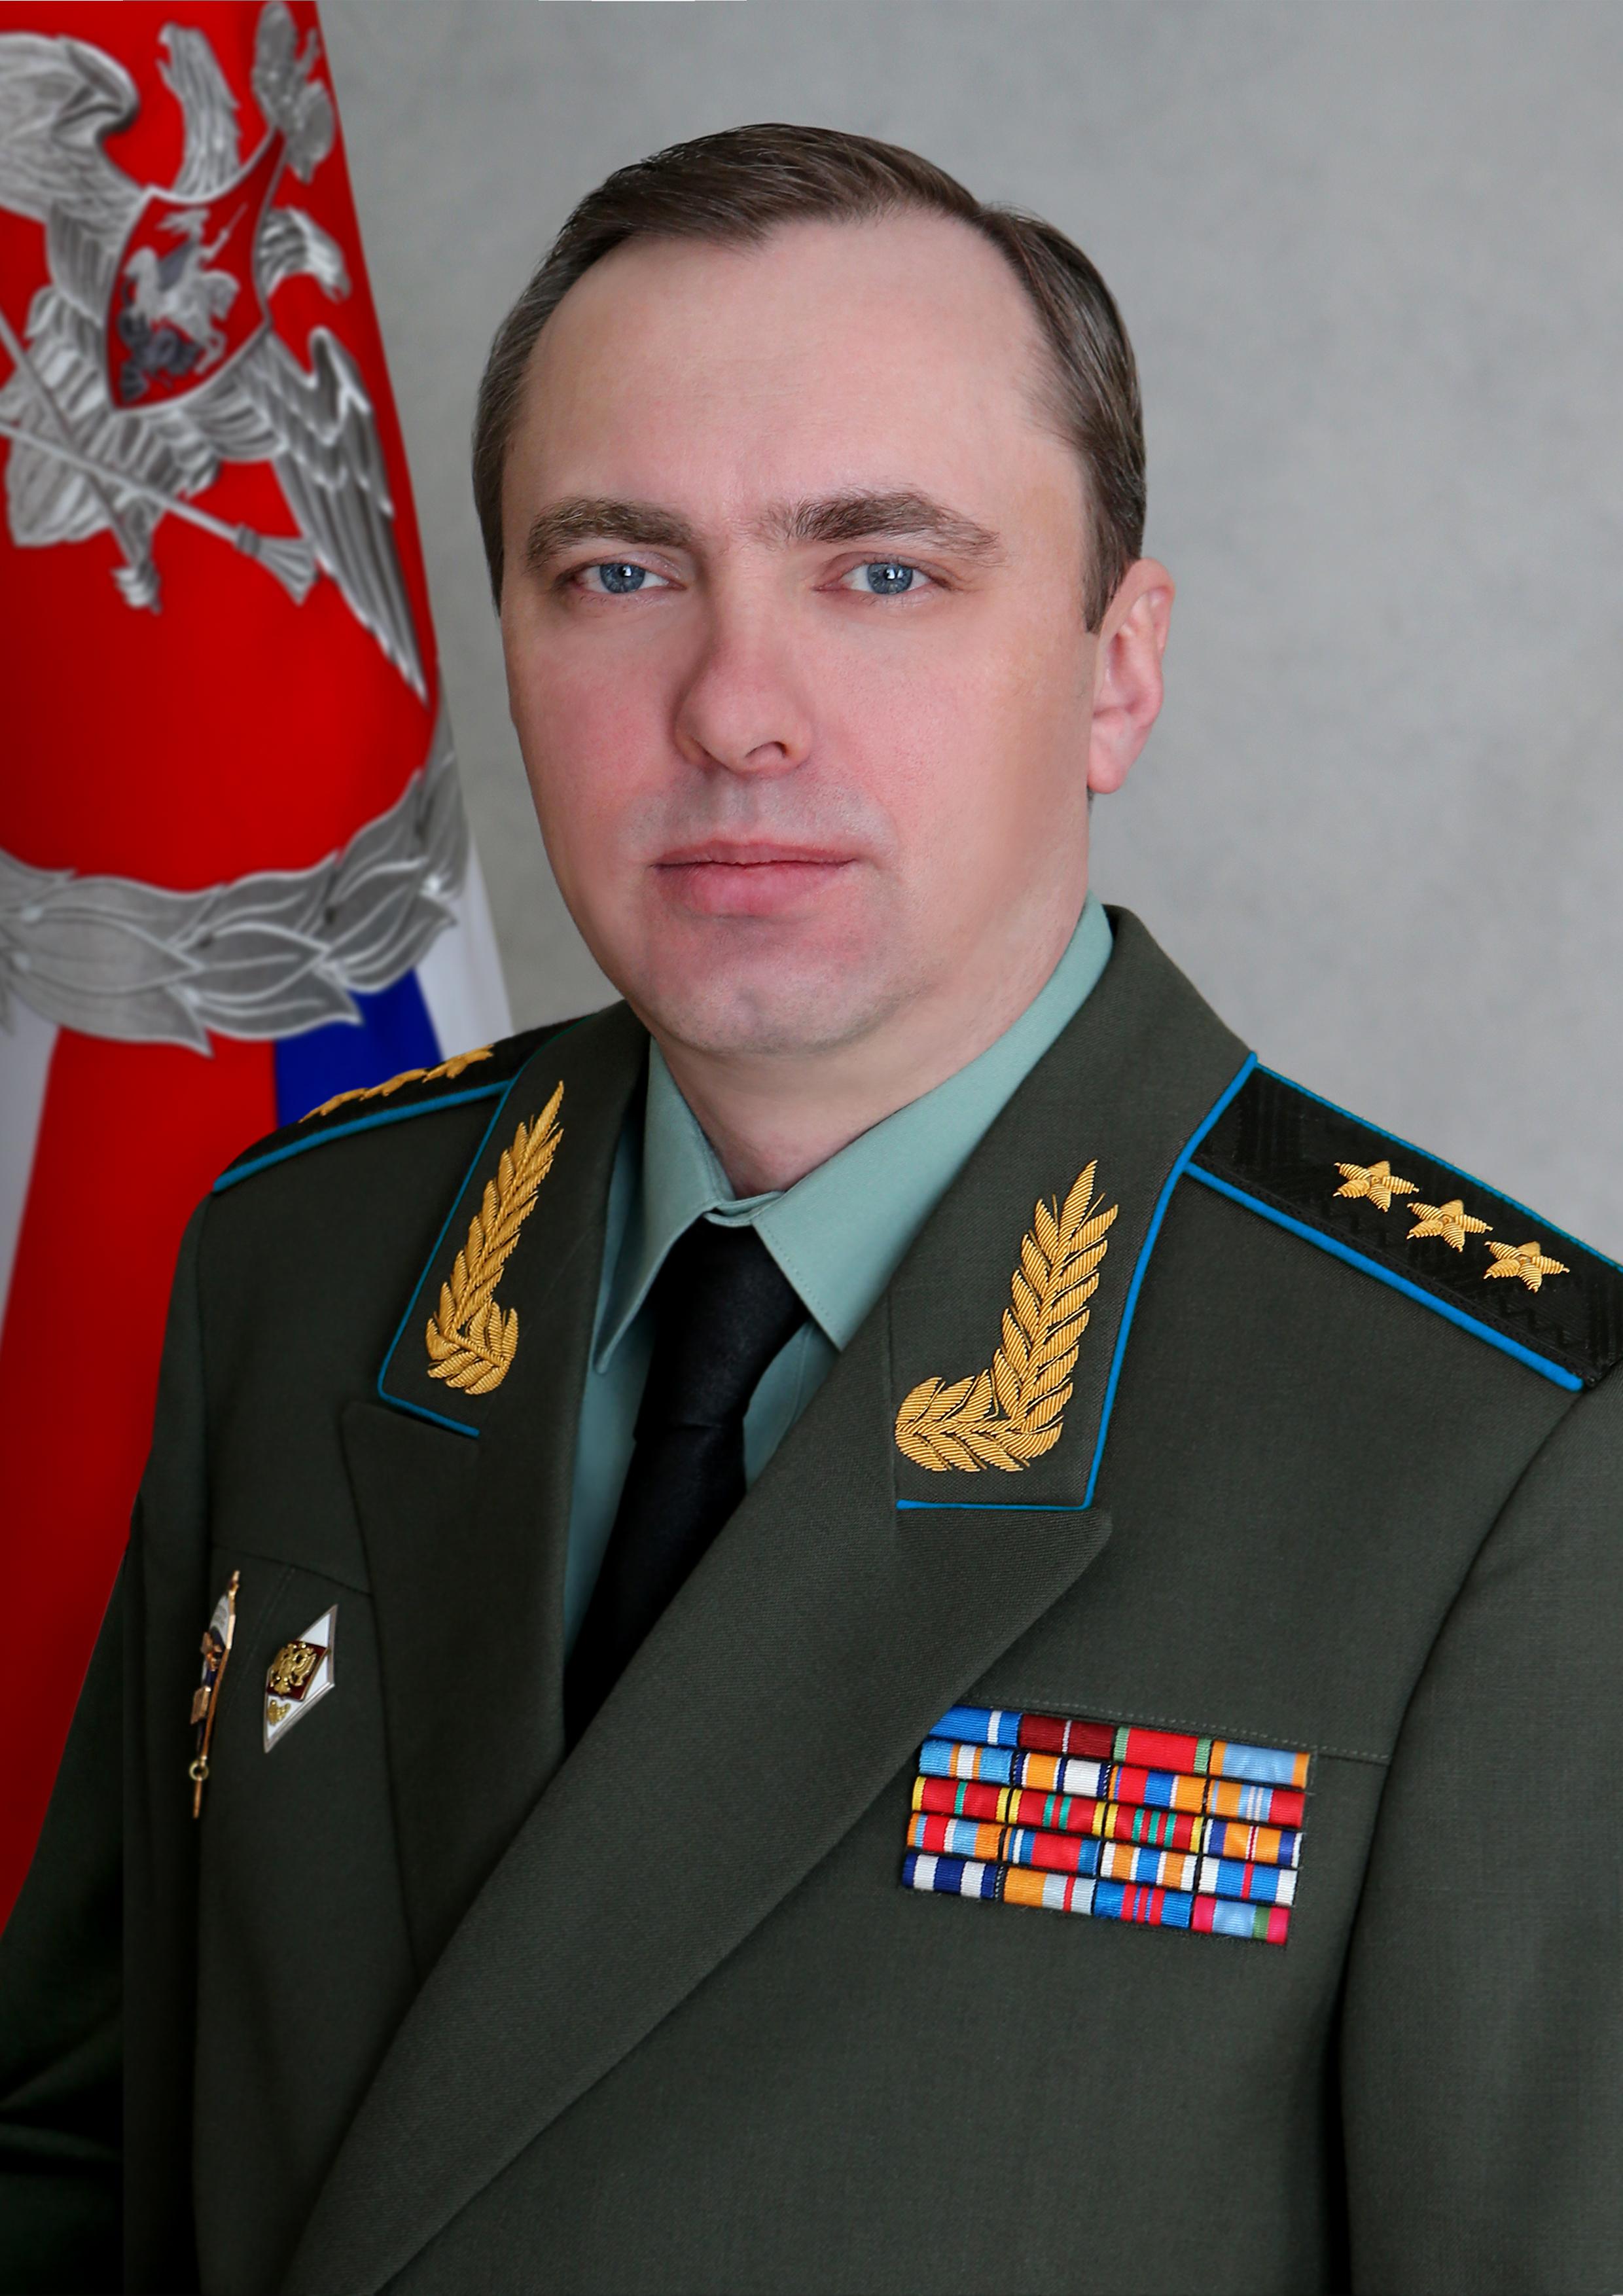 https://upload.wikimedia.org/wikipedia/commons/7/7c/Yuriy_Sadovenko_%28General%29.jpg